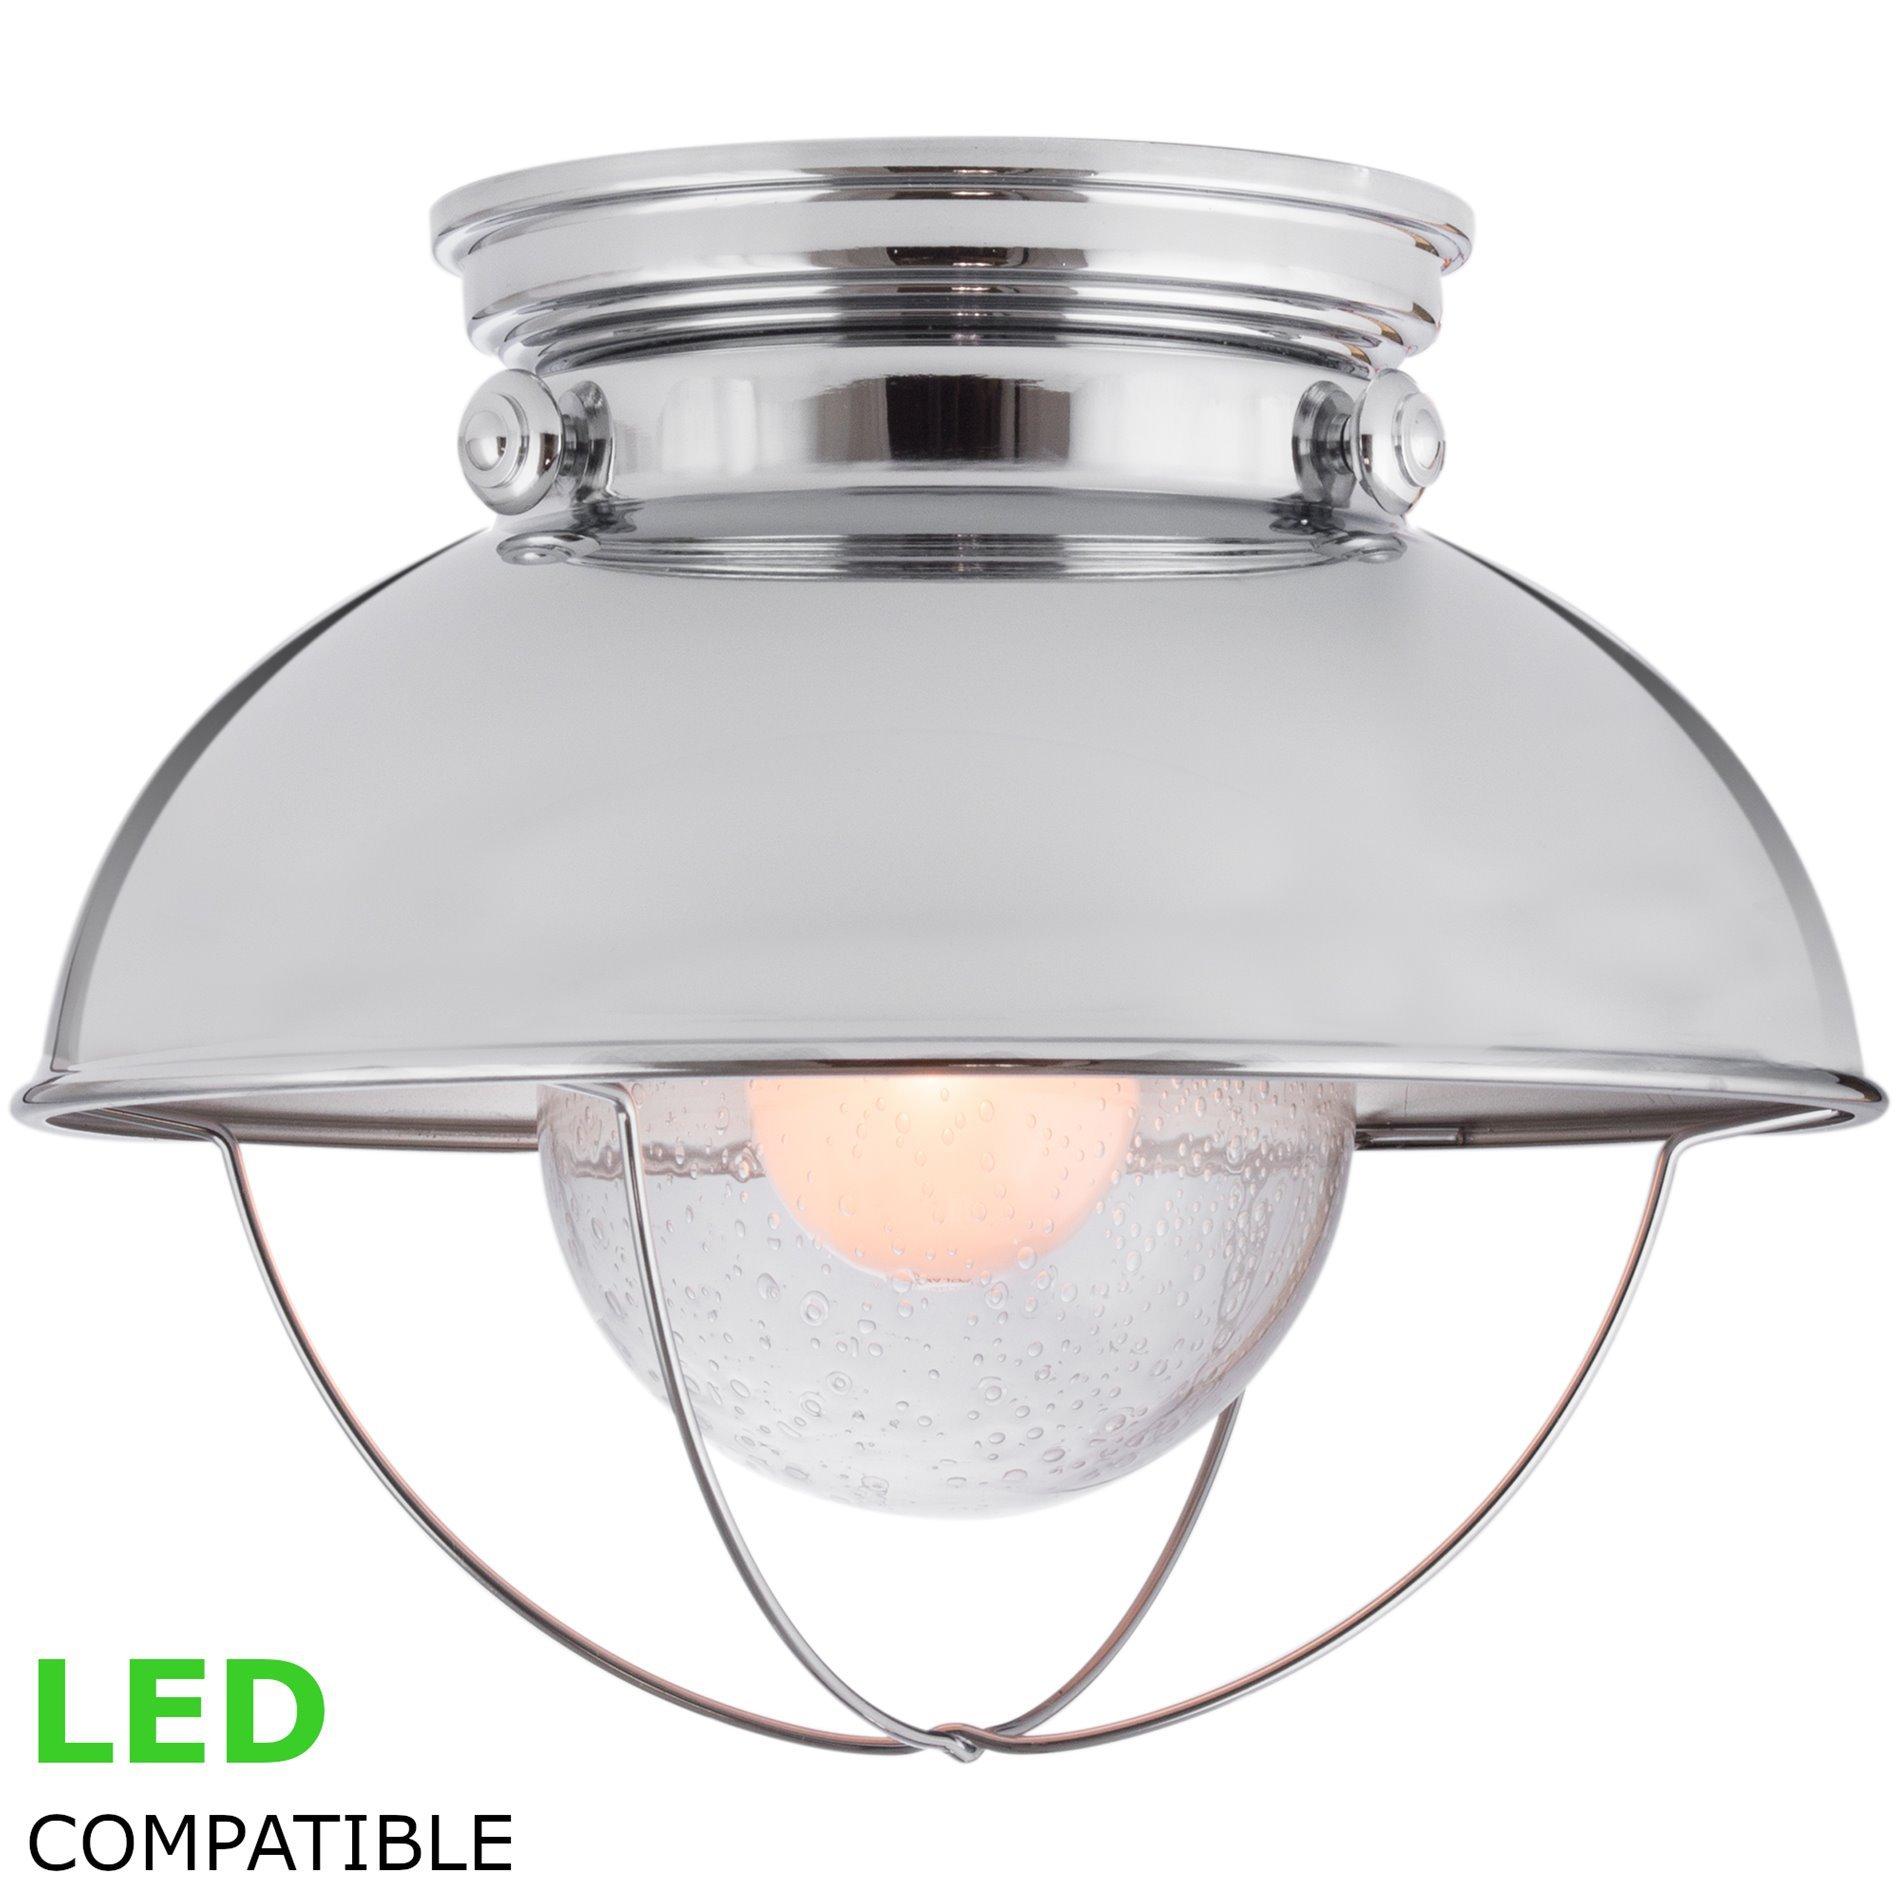 Kira Home Bayside 11'' Industrial Farmhouse Flush Mount Ceiling Light + Bubble Glass Shade, Chrome Finish